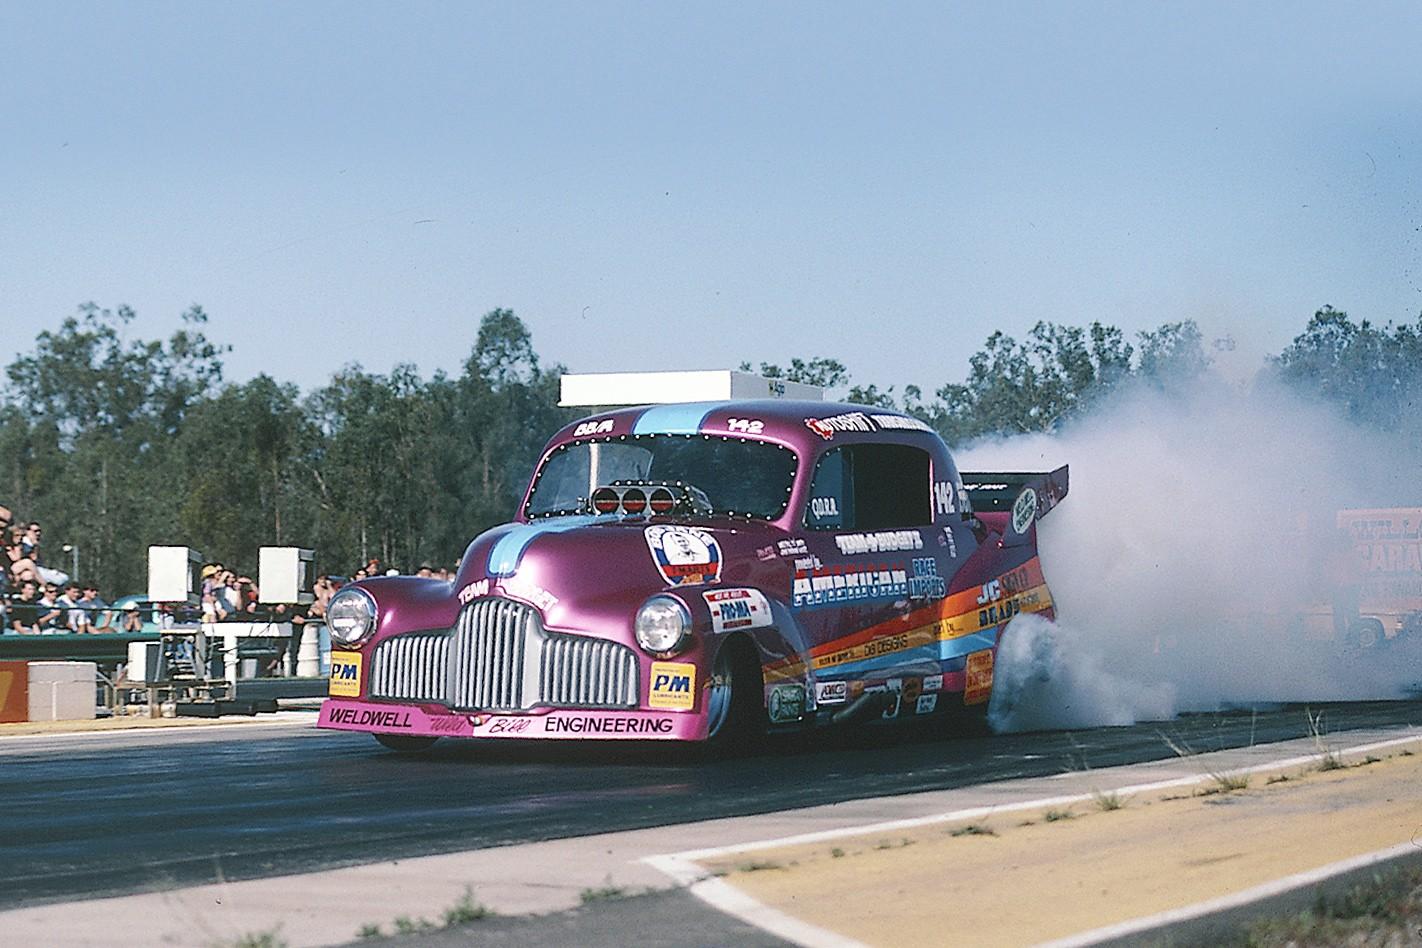 Holden FJ funnycar